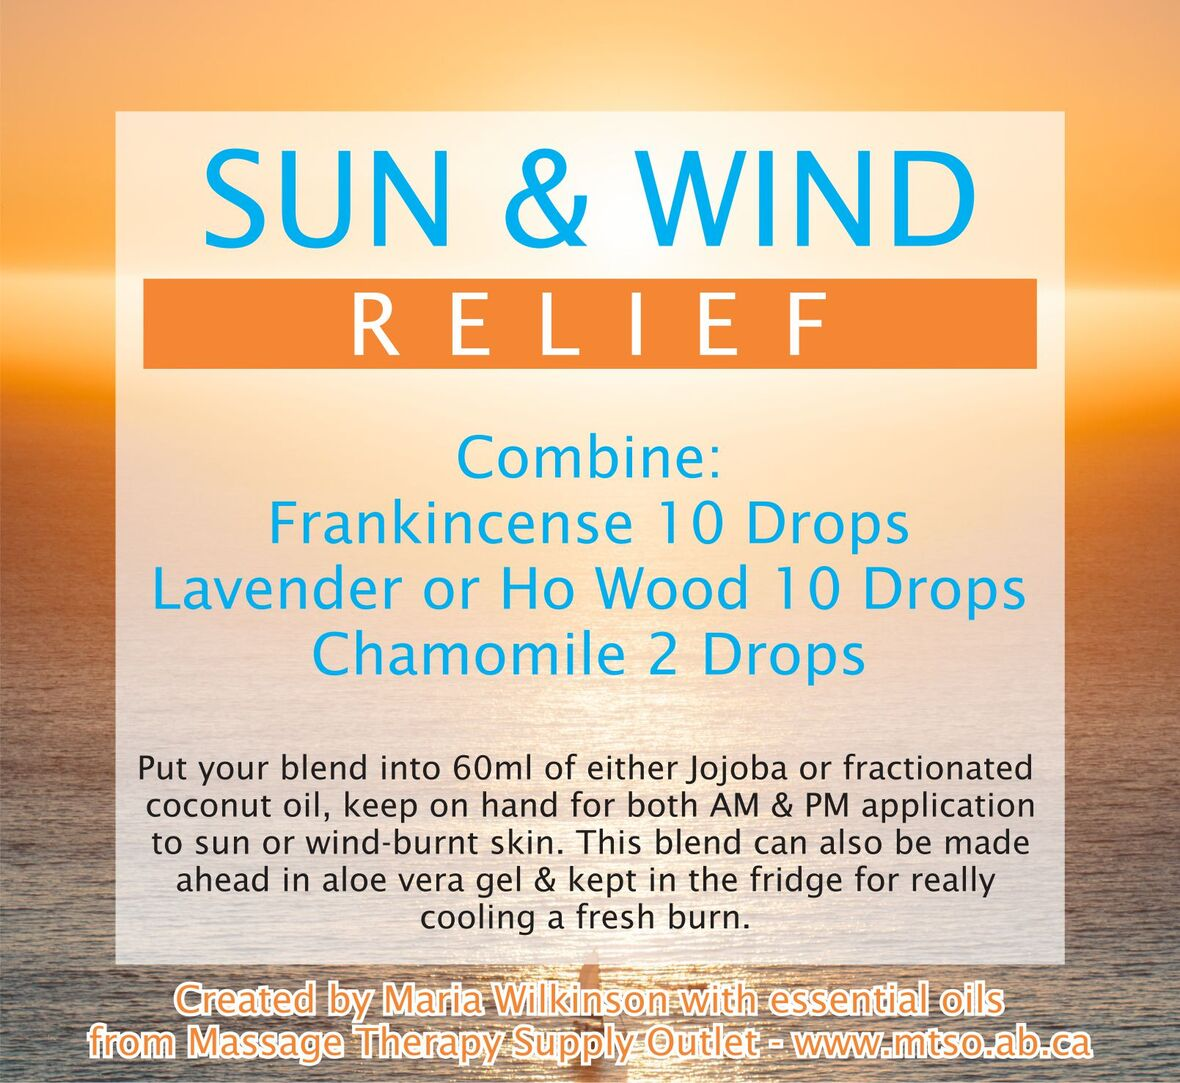 Sunwindrelief